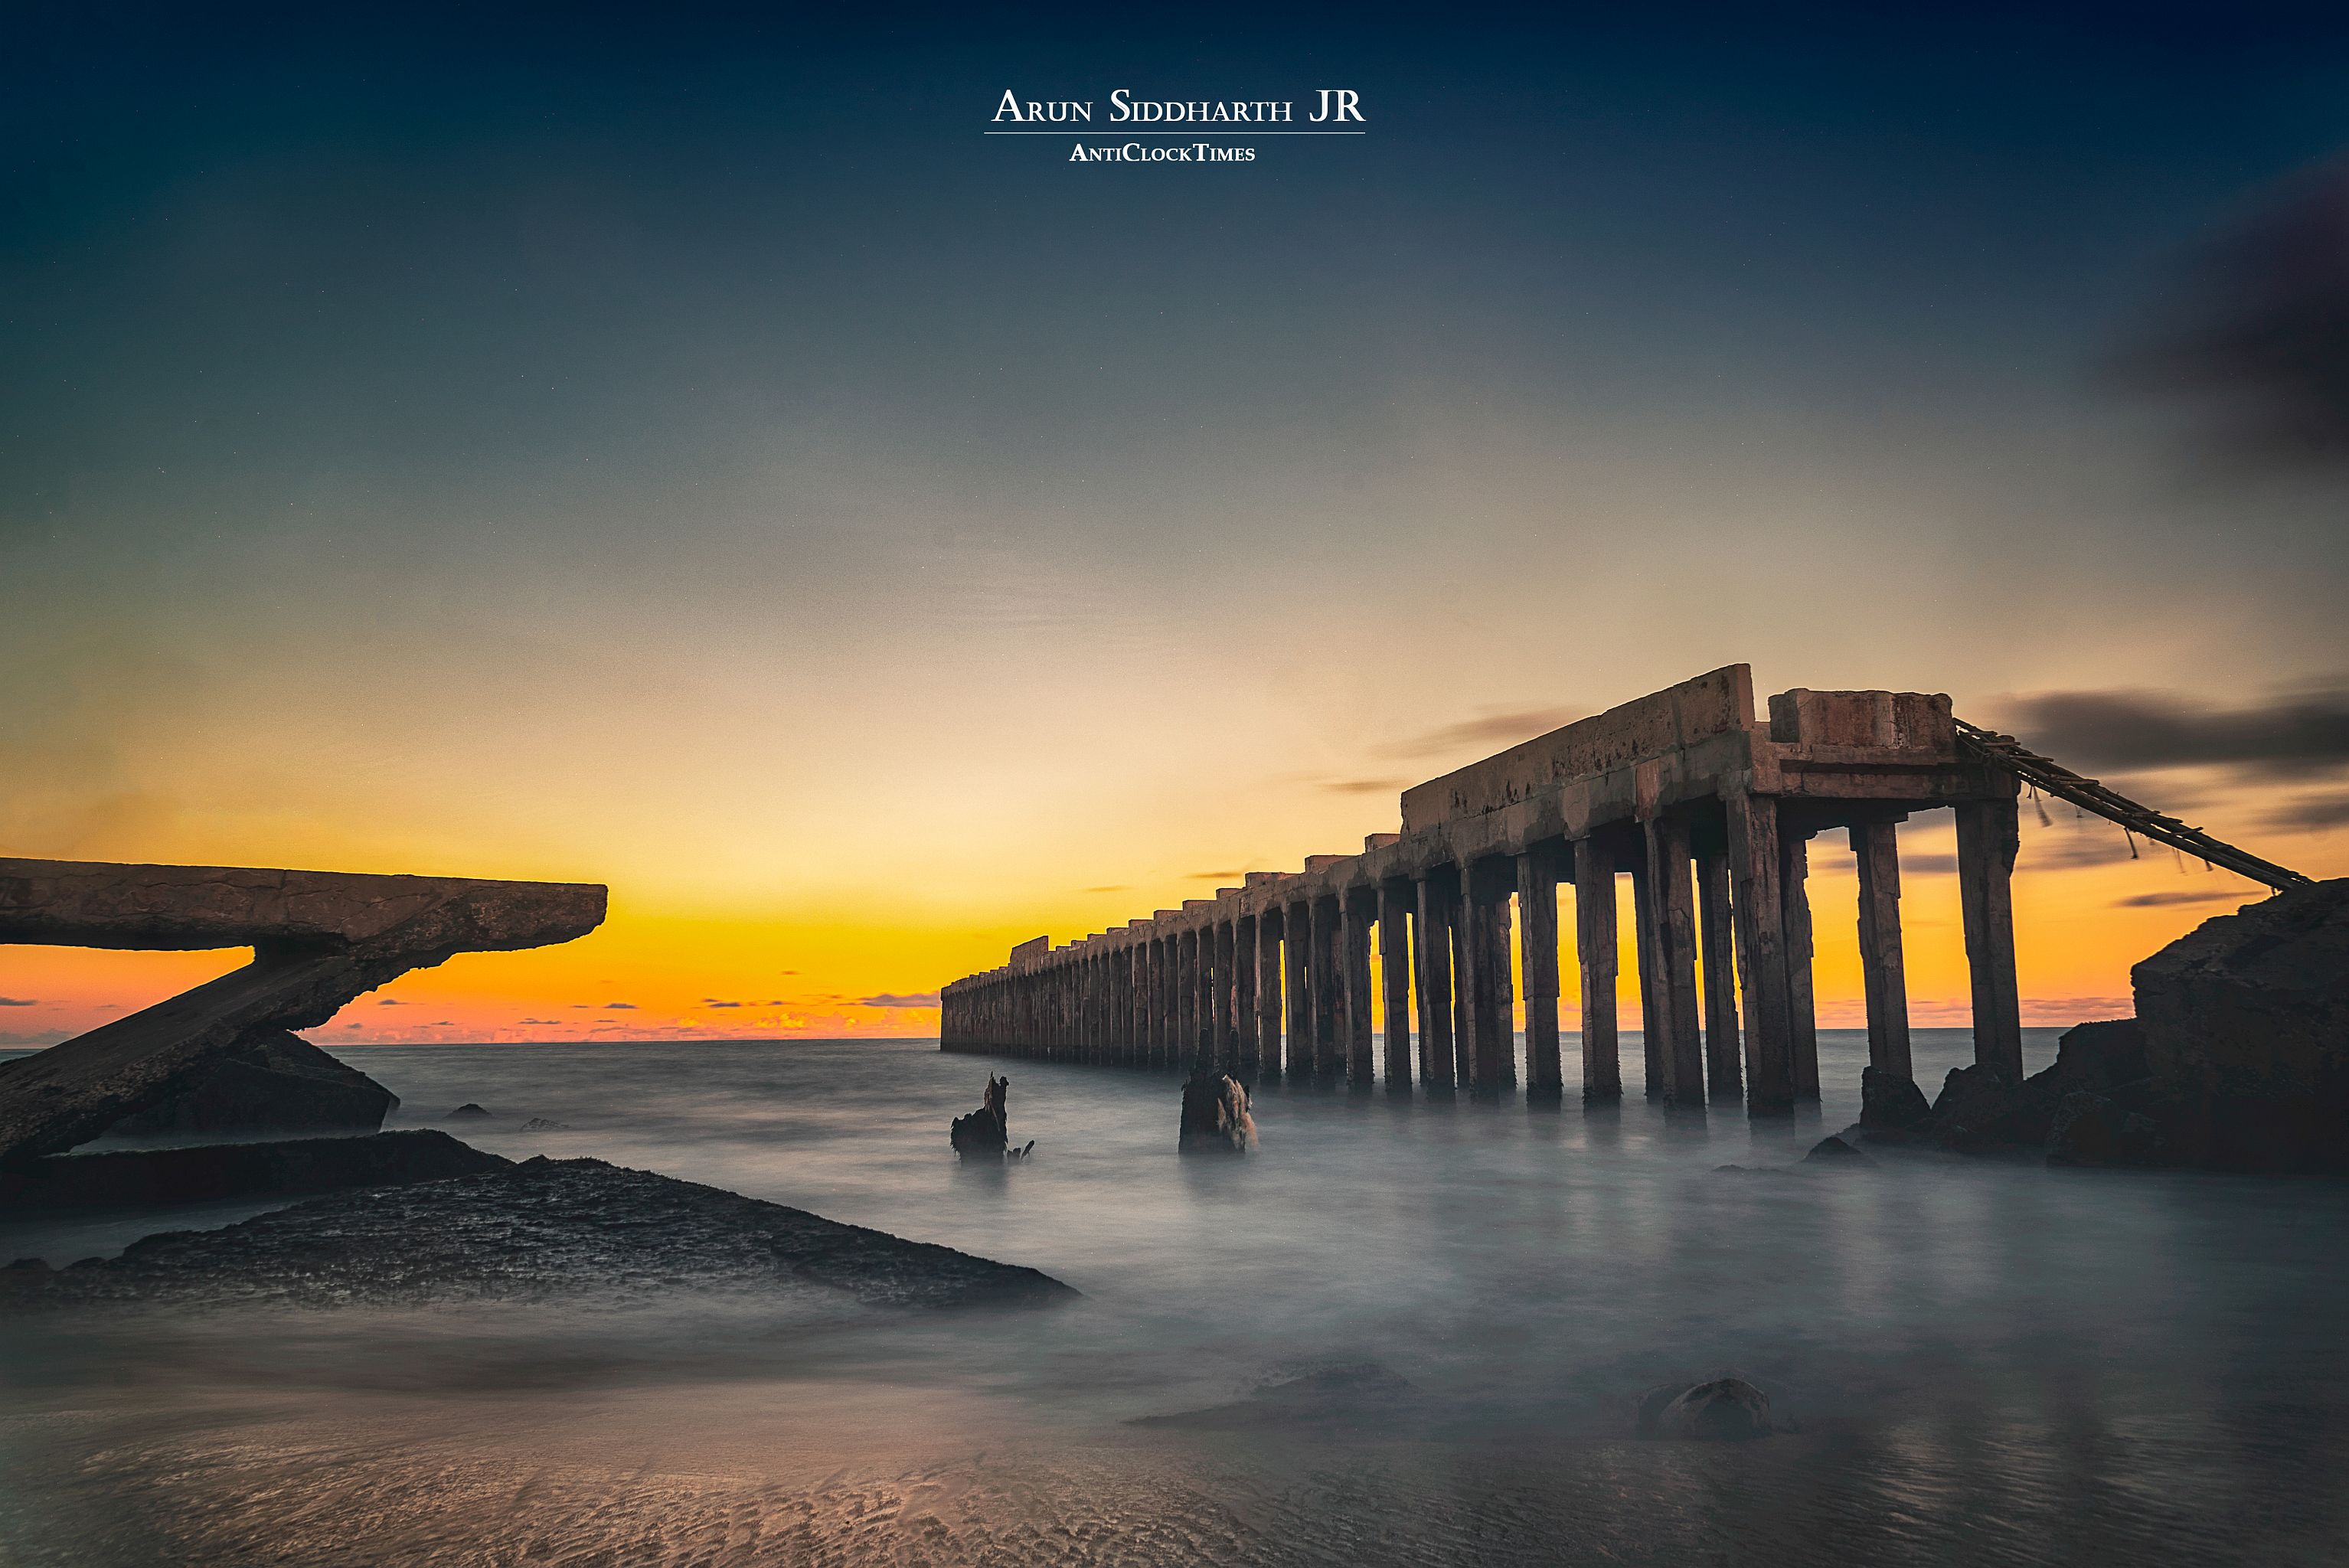 Structure & Seascape